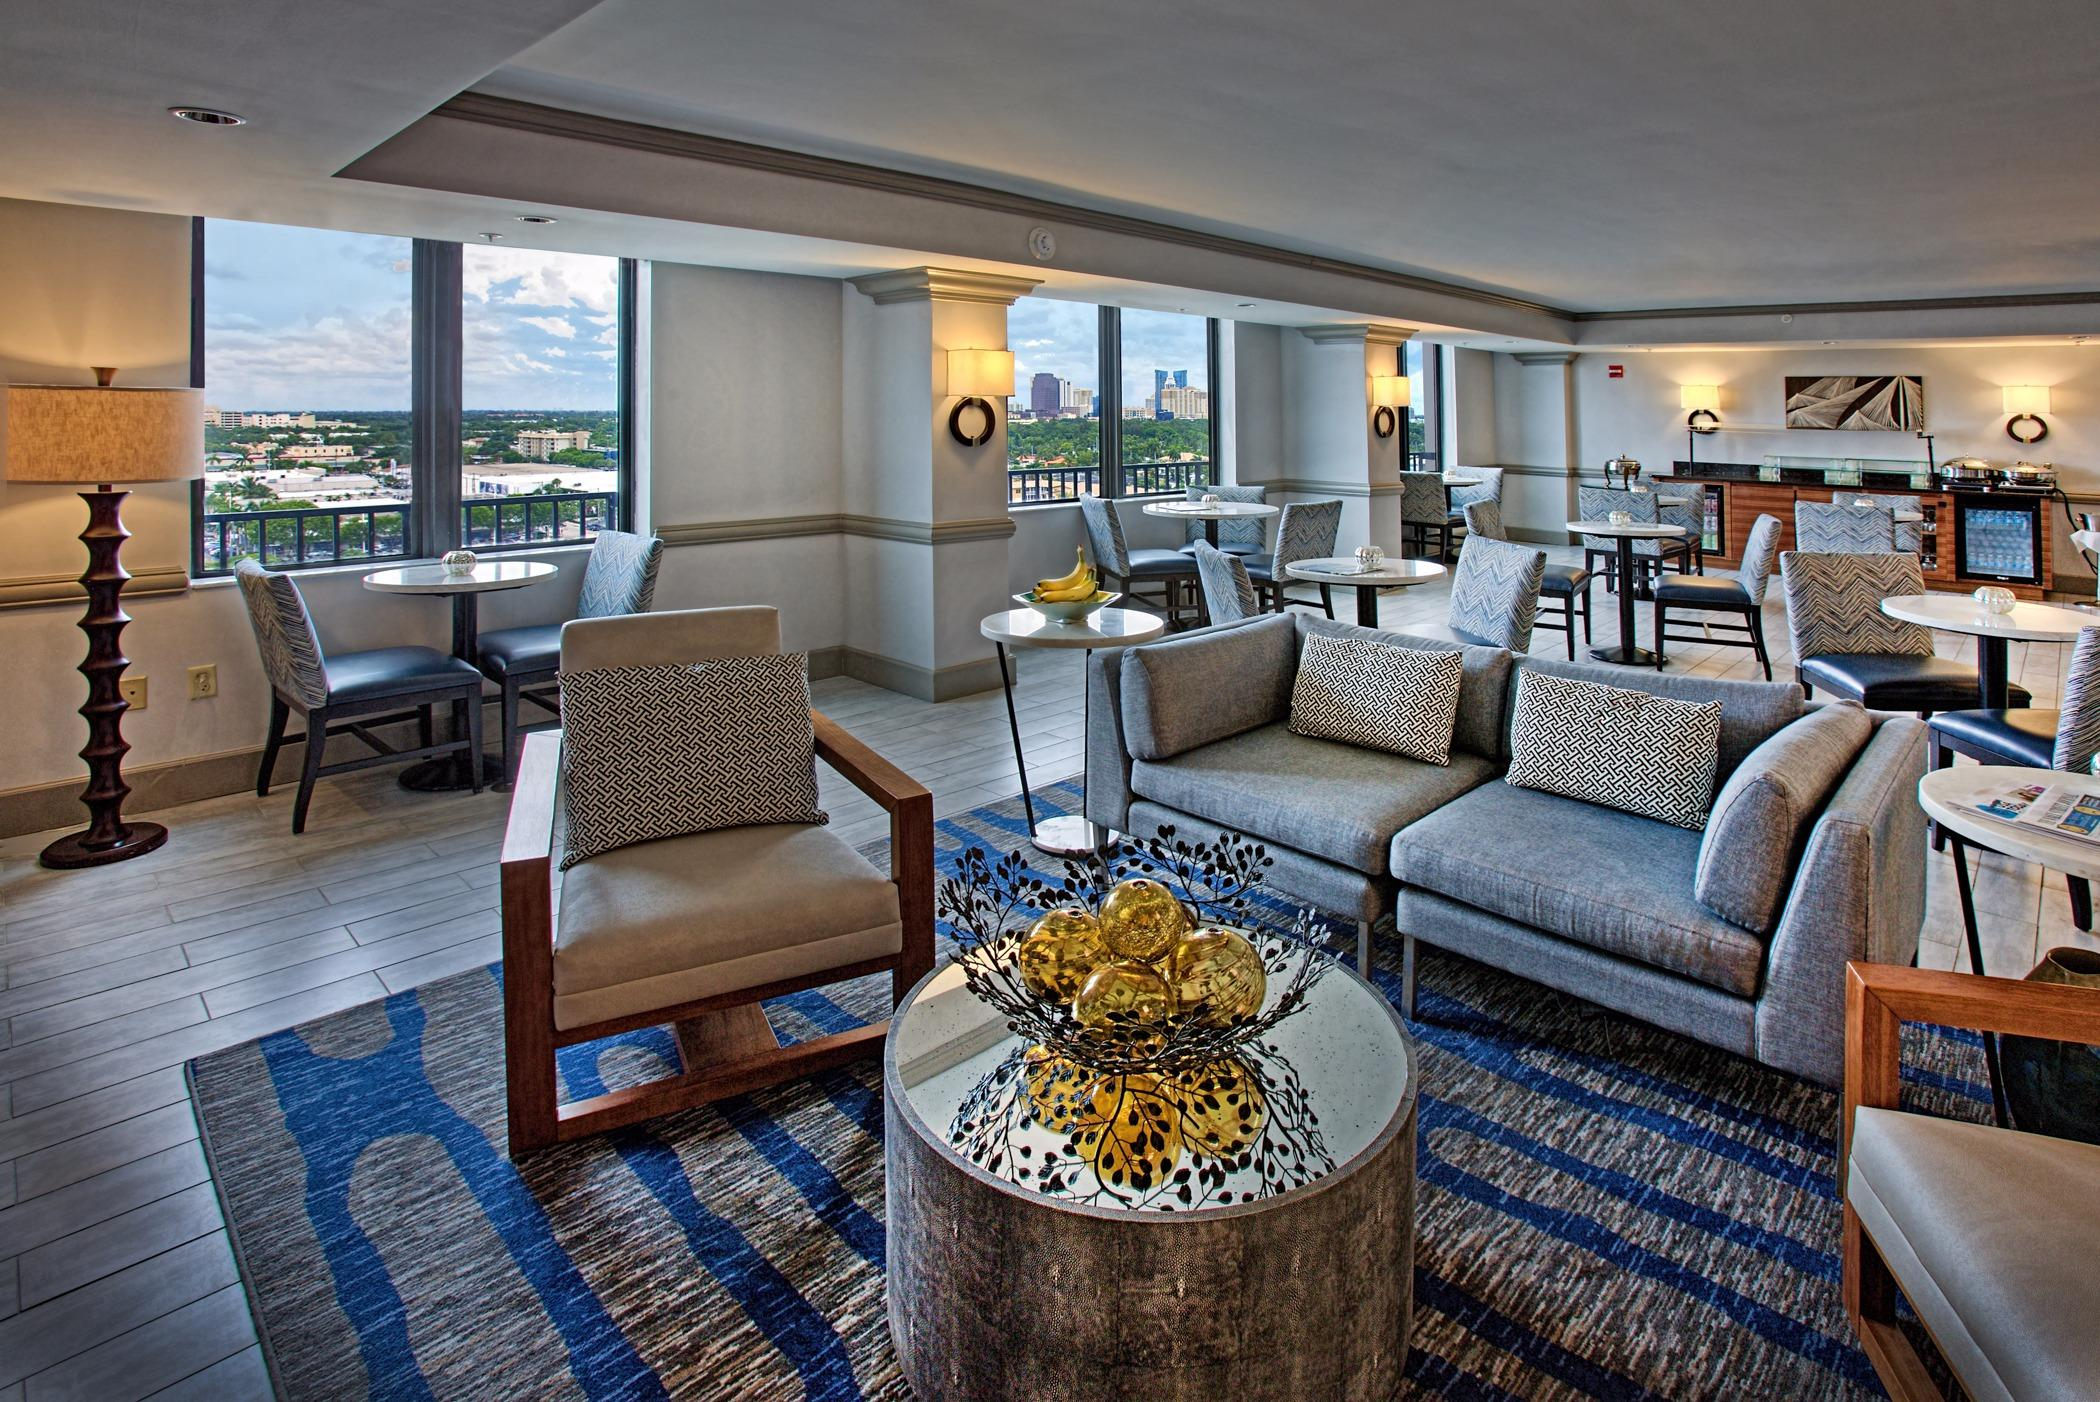 Renaissance Fort Lauderdale Cruise Port Hotel image 6